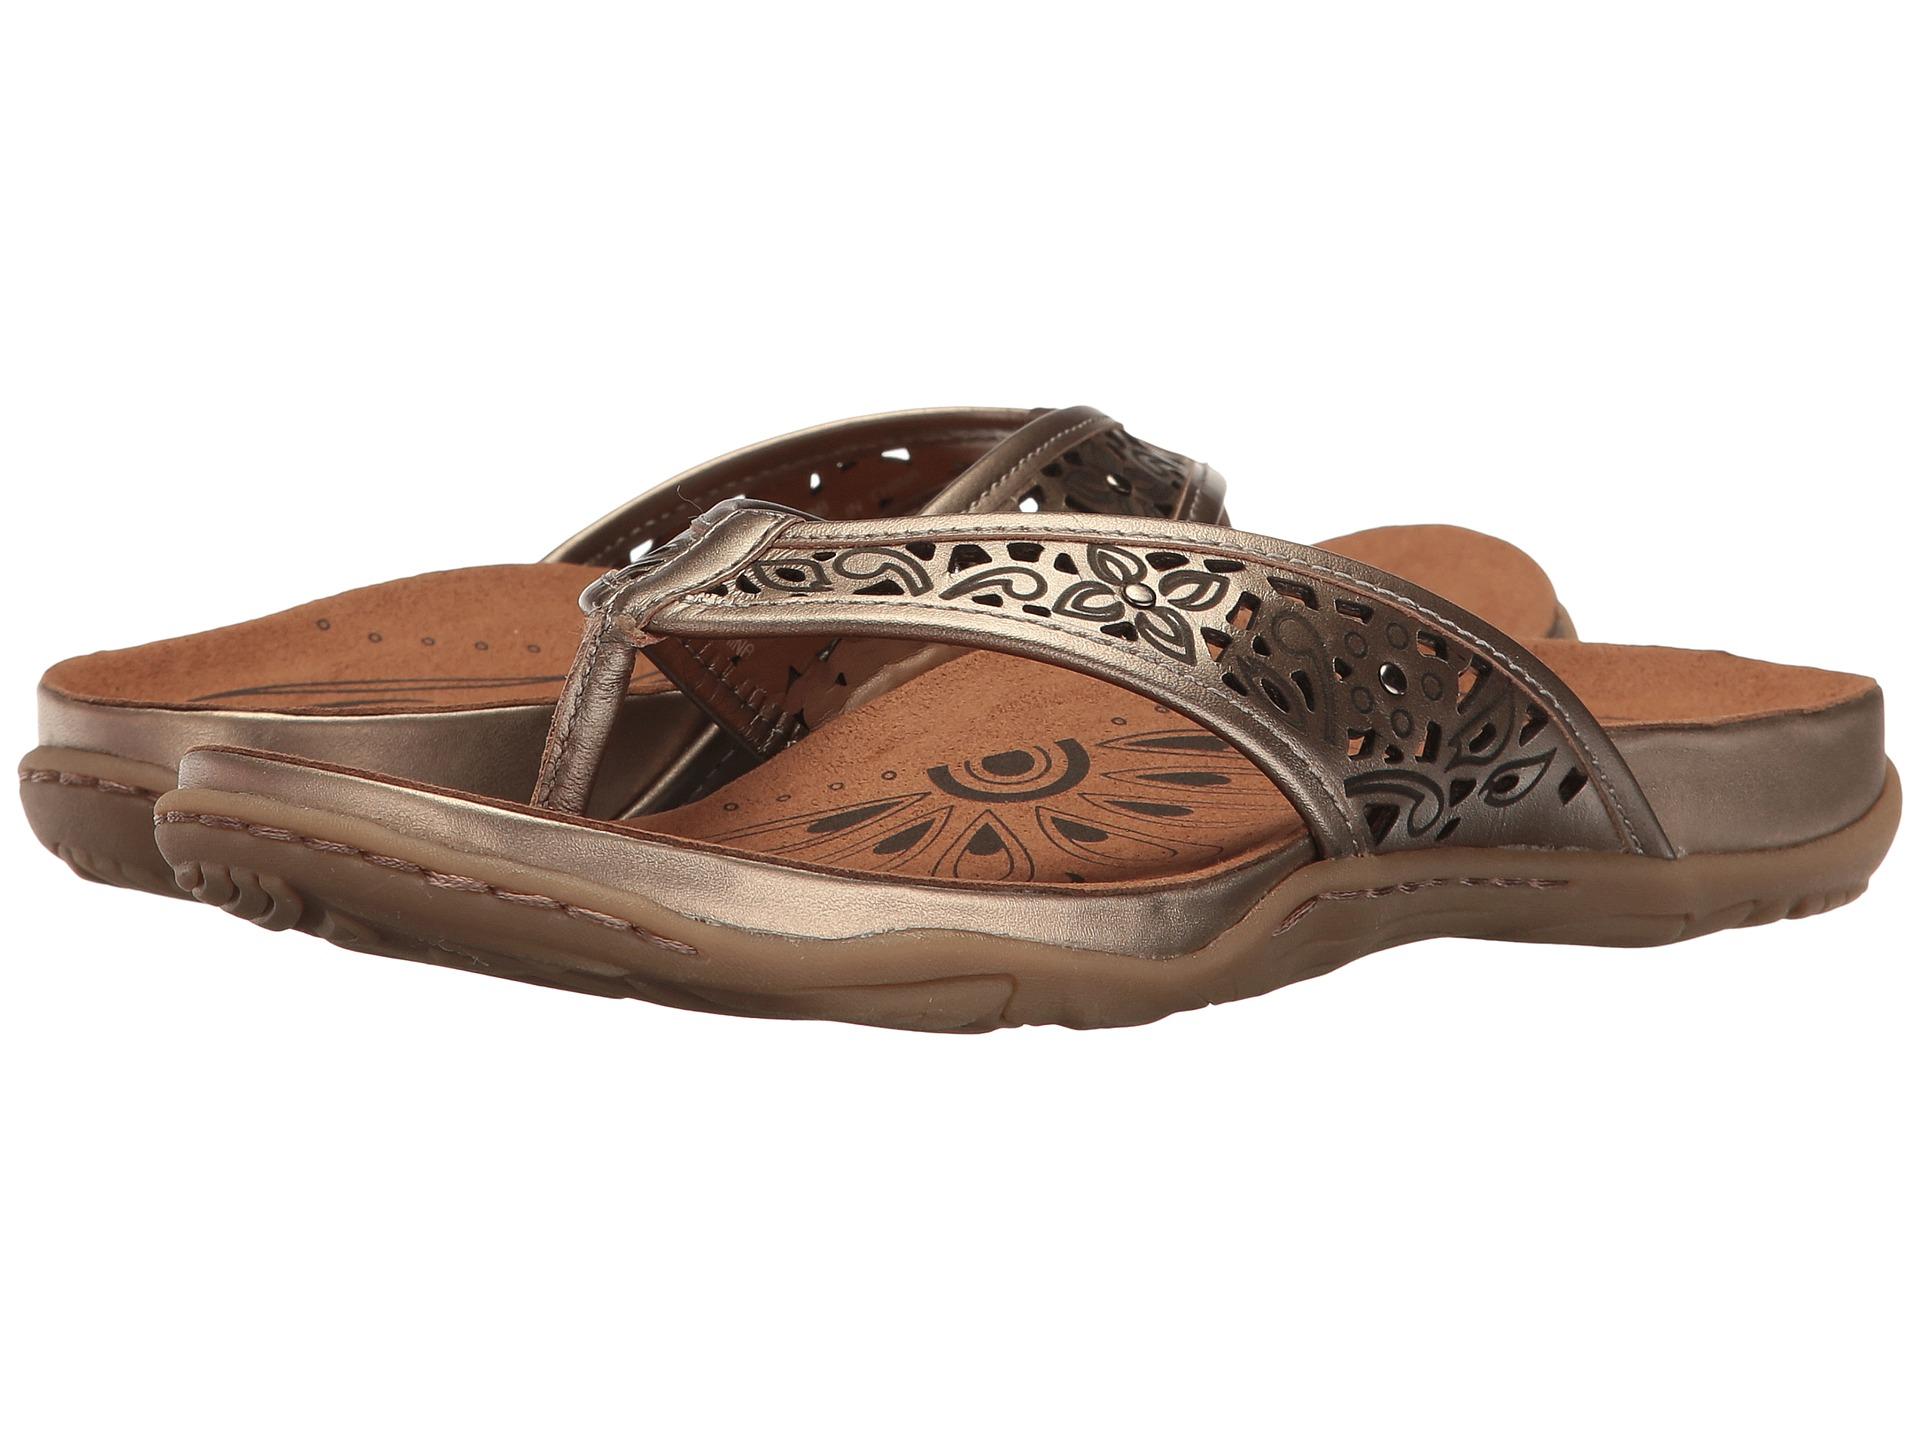 Earth Brand Shoes Maya